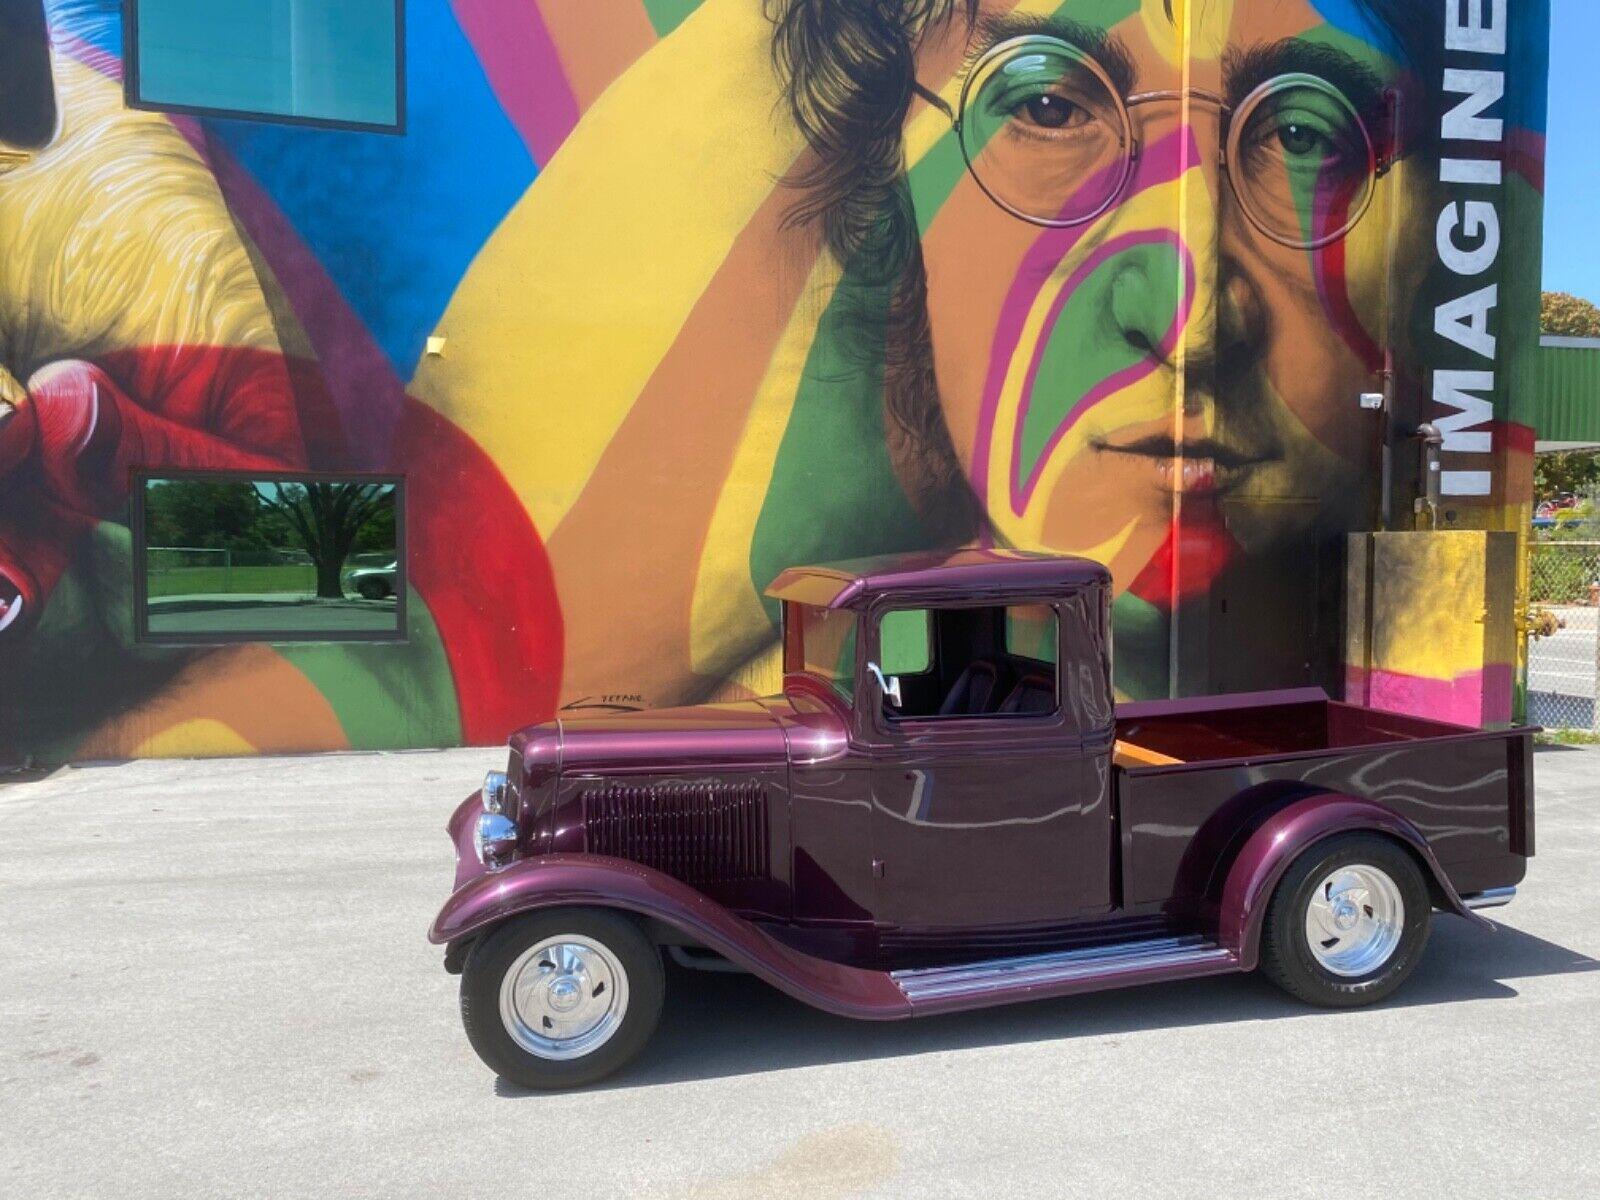 1934 FORD PICK UP ALL STEEL V8 350 A/C HOT ROD SUPER CLEAN RESTORED 954 937 8271